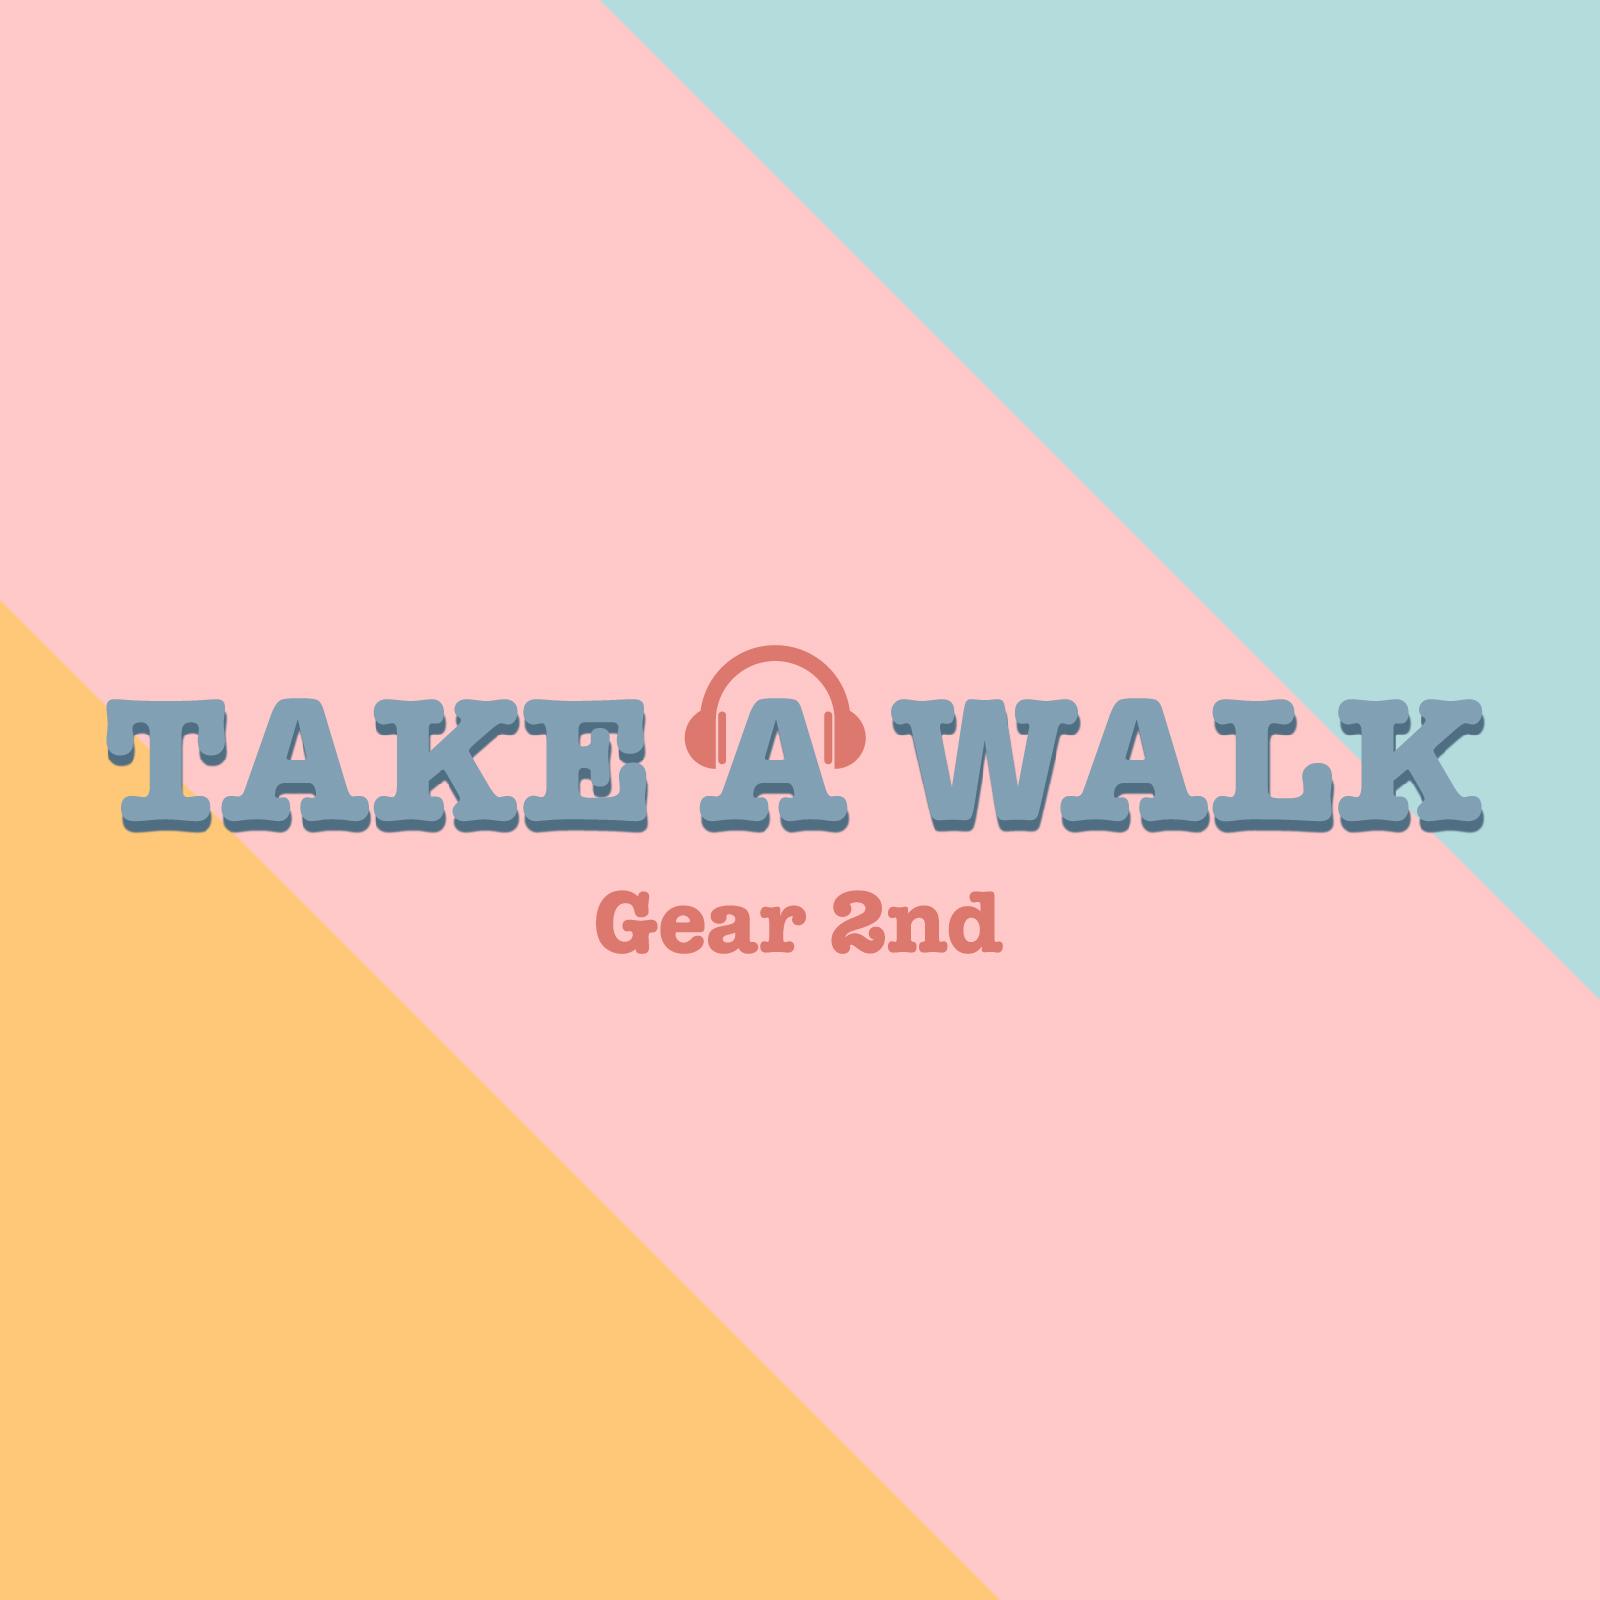 Gear 2nd アルバム先行配信 第一弾『TAKE A WALK』